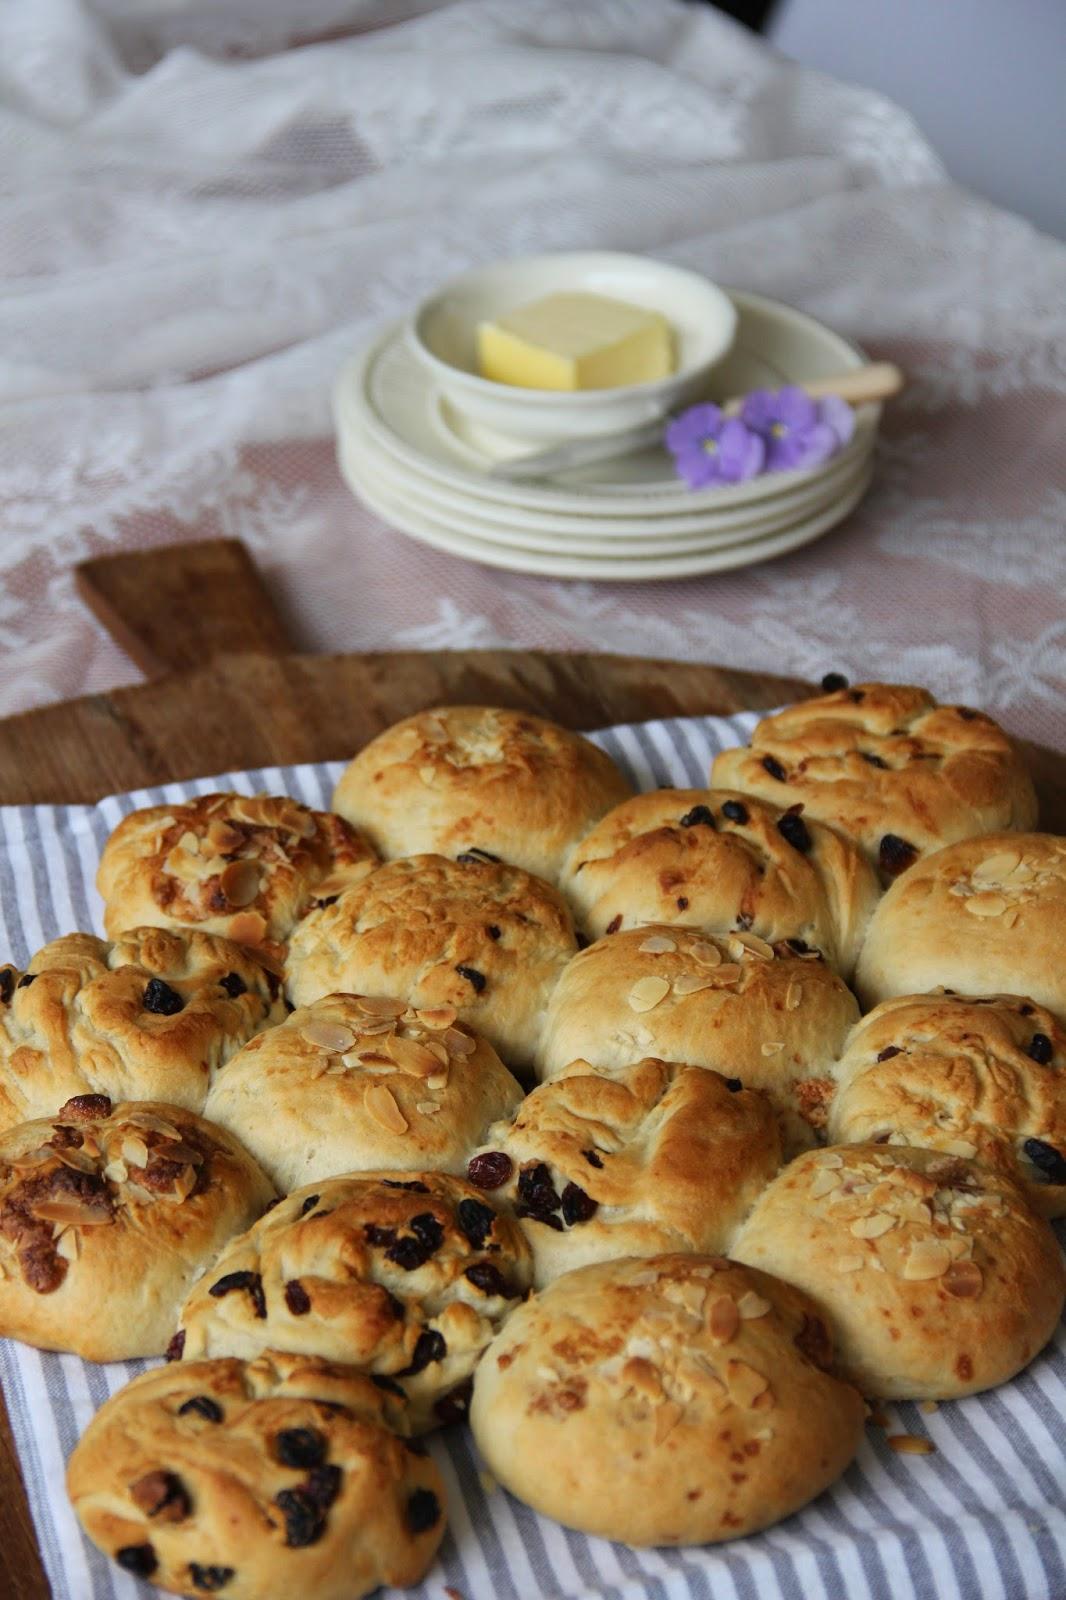 Paasbreekbrood met kaneel-amandelspijs - www.desmaakvancecile.com